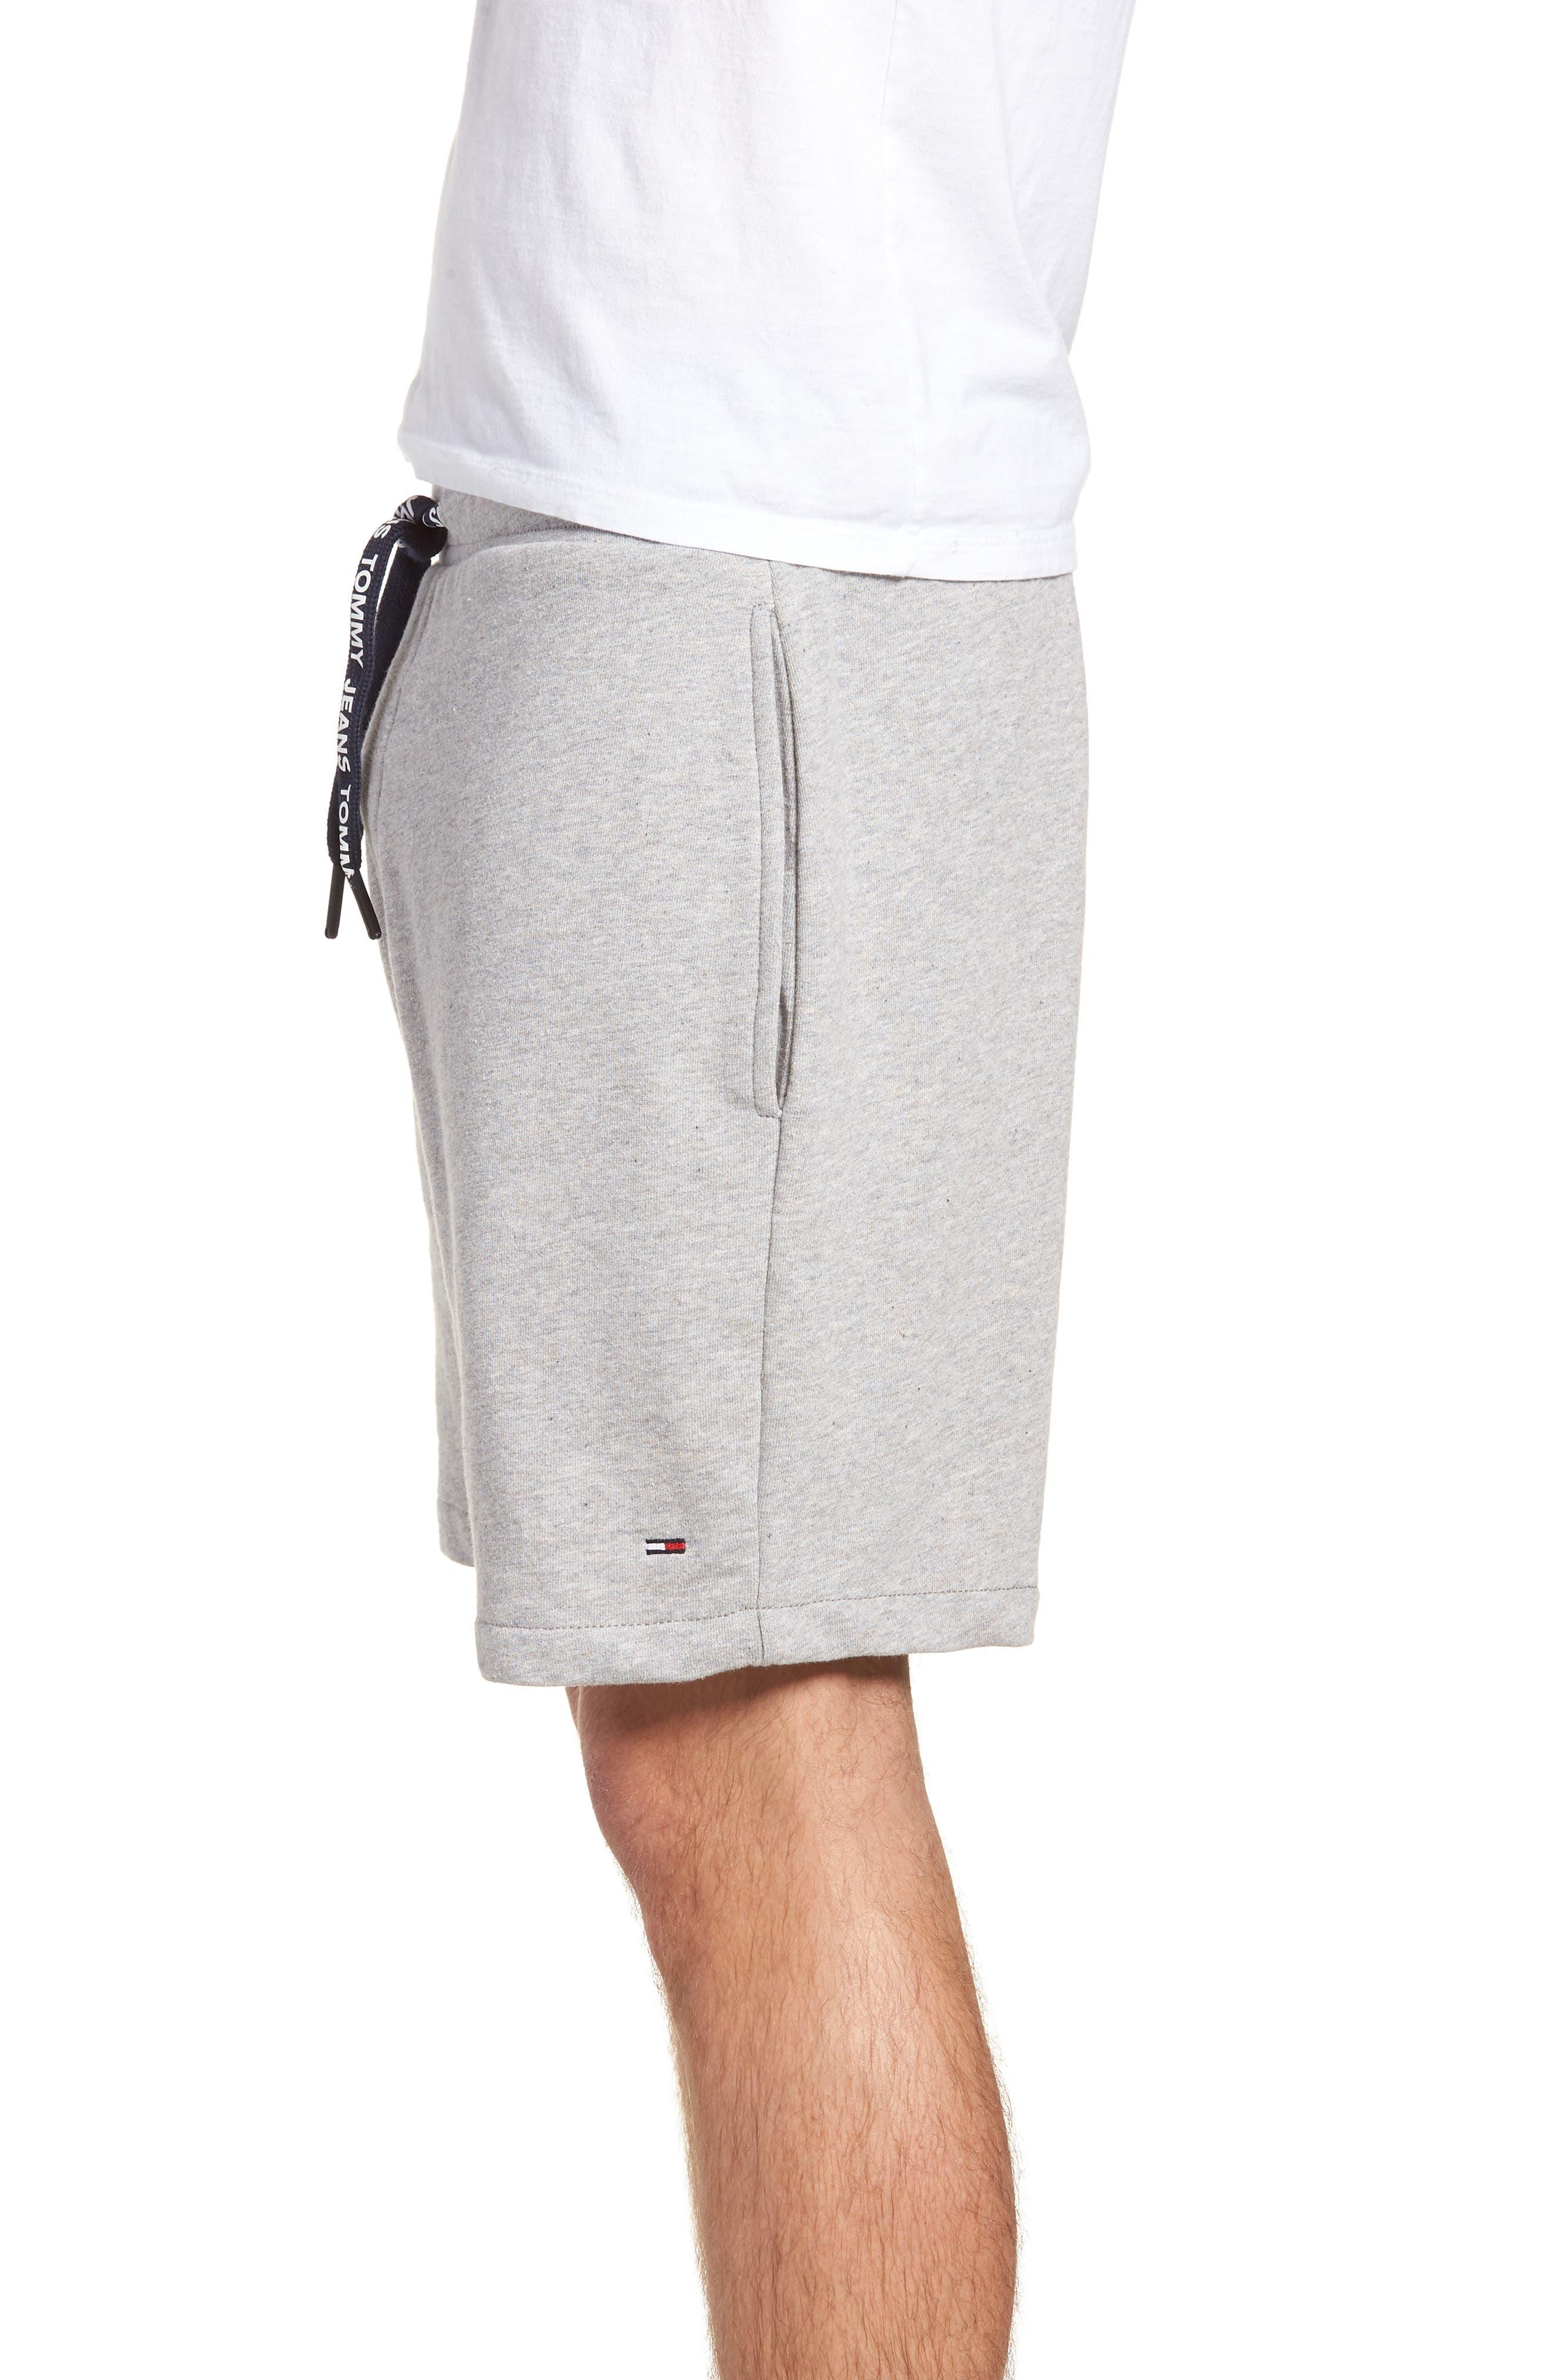 Sweat Shorts,                             Alternate thumbnail 3, color,                             038